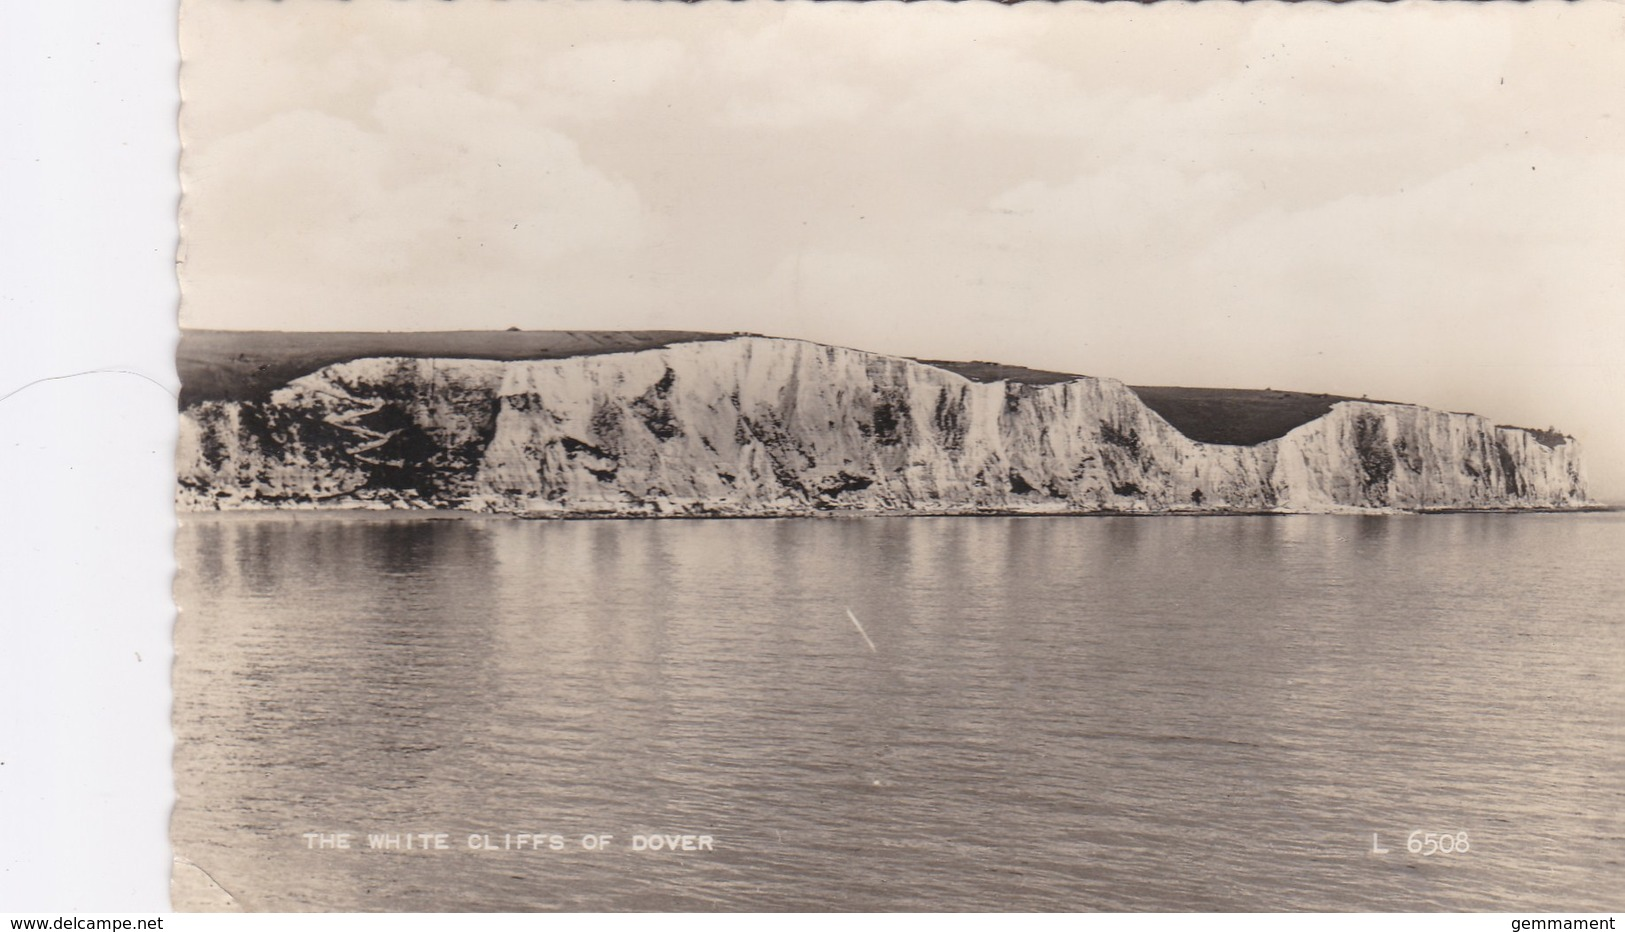 THE WHITE CLIFFS OF DOVER - Dover